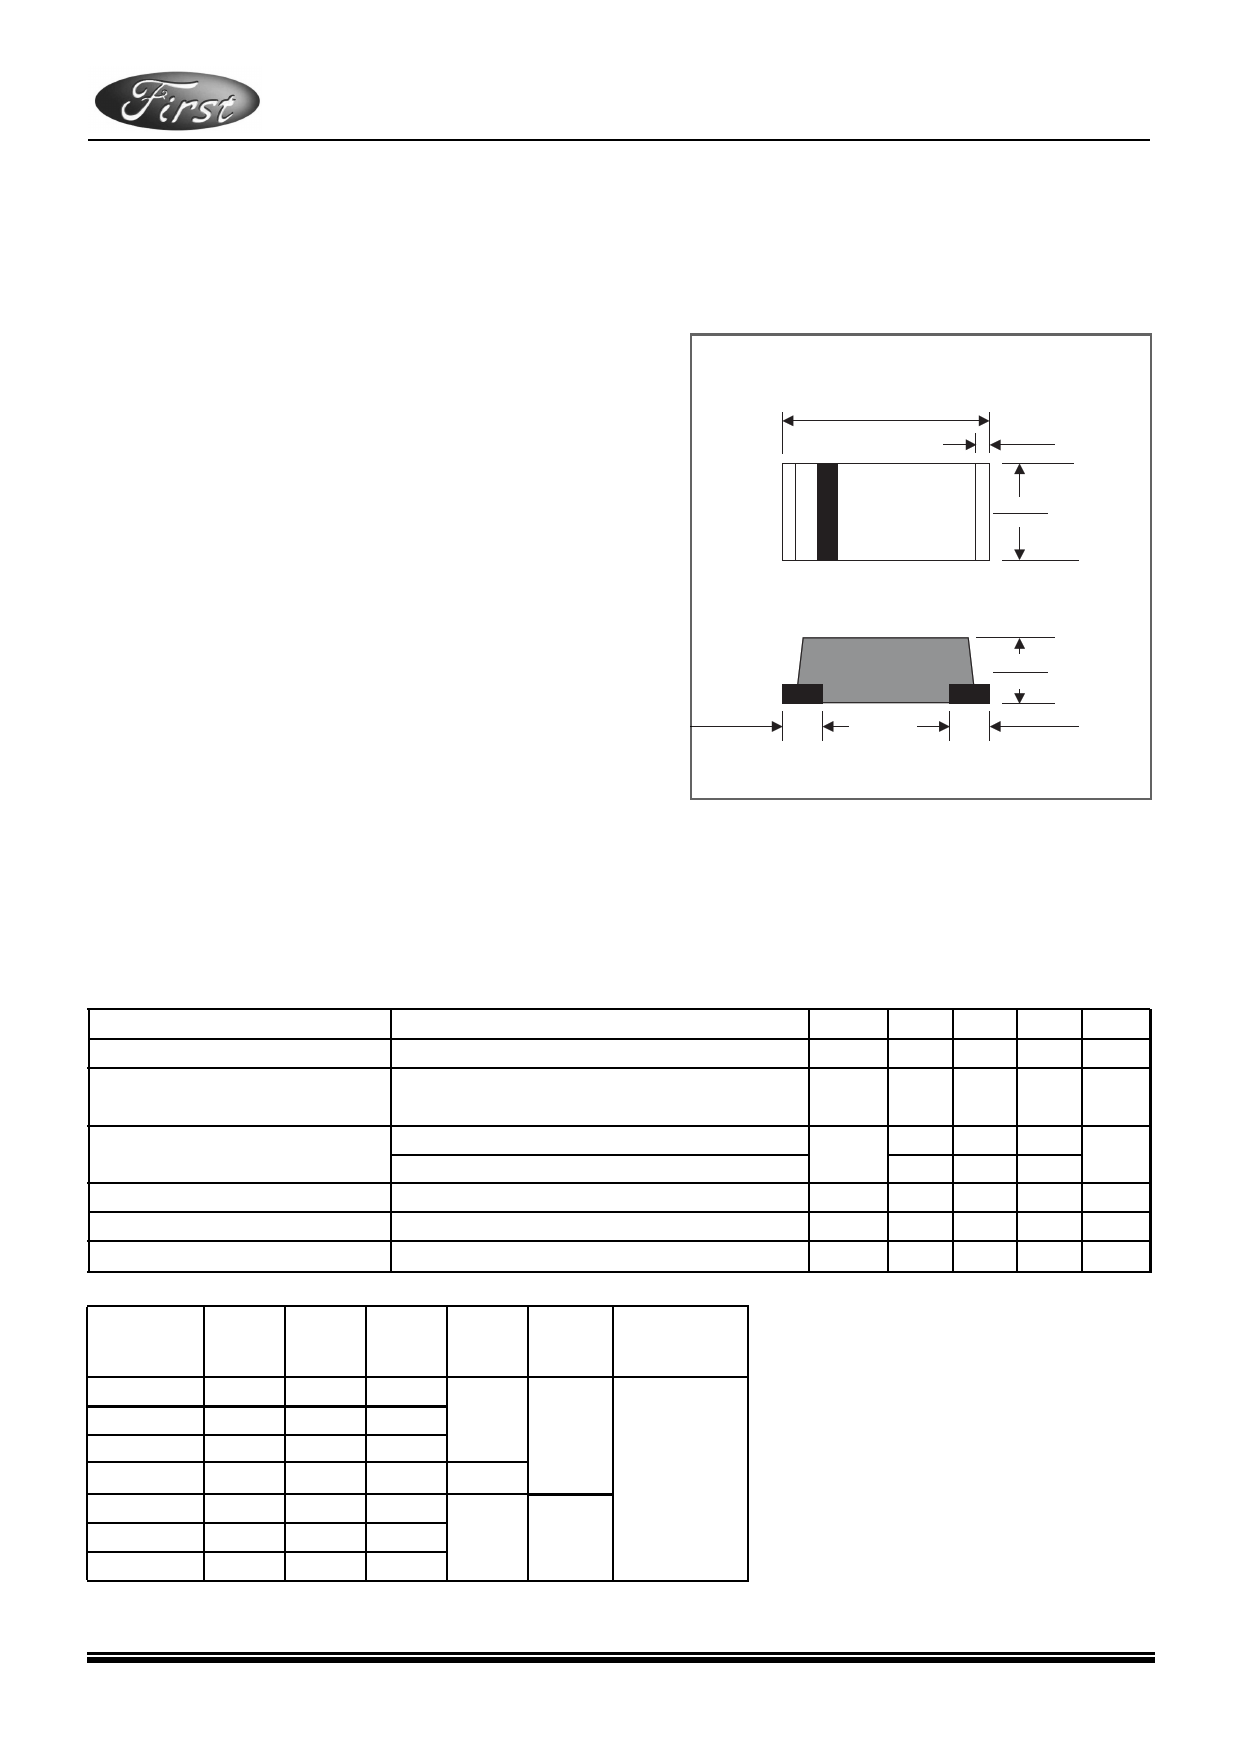 MURA3100G دیتاشیت PDF